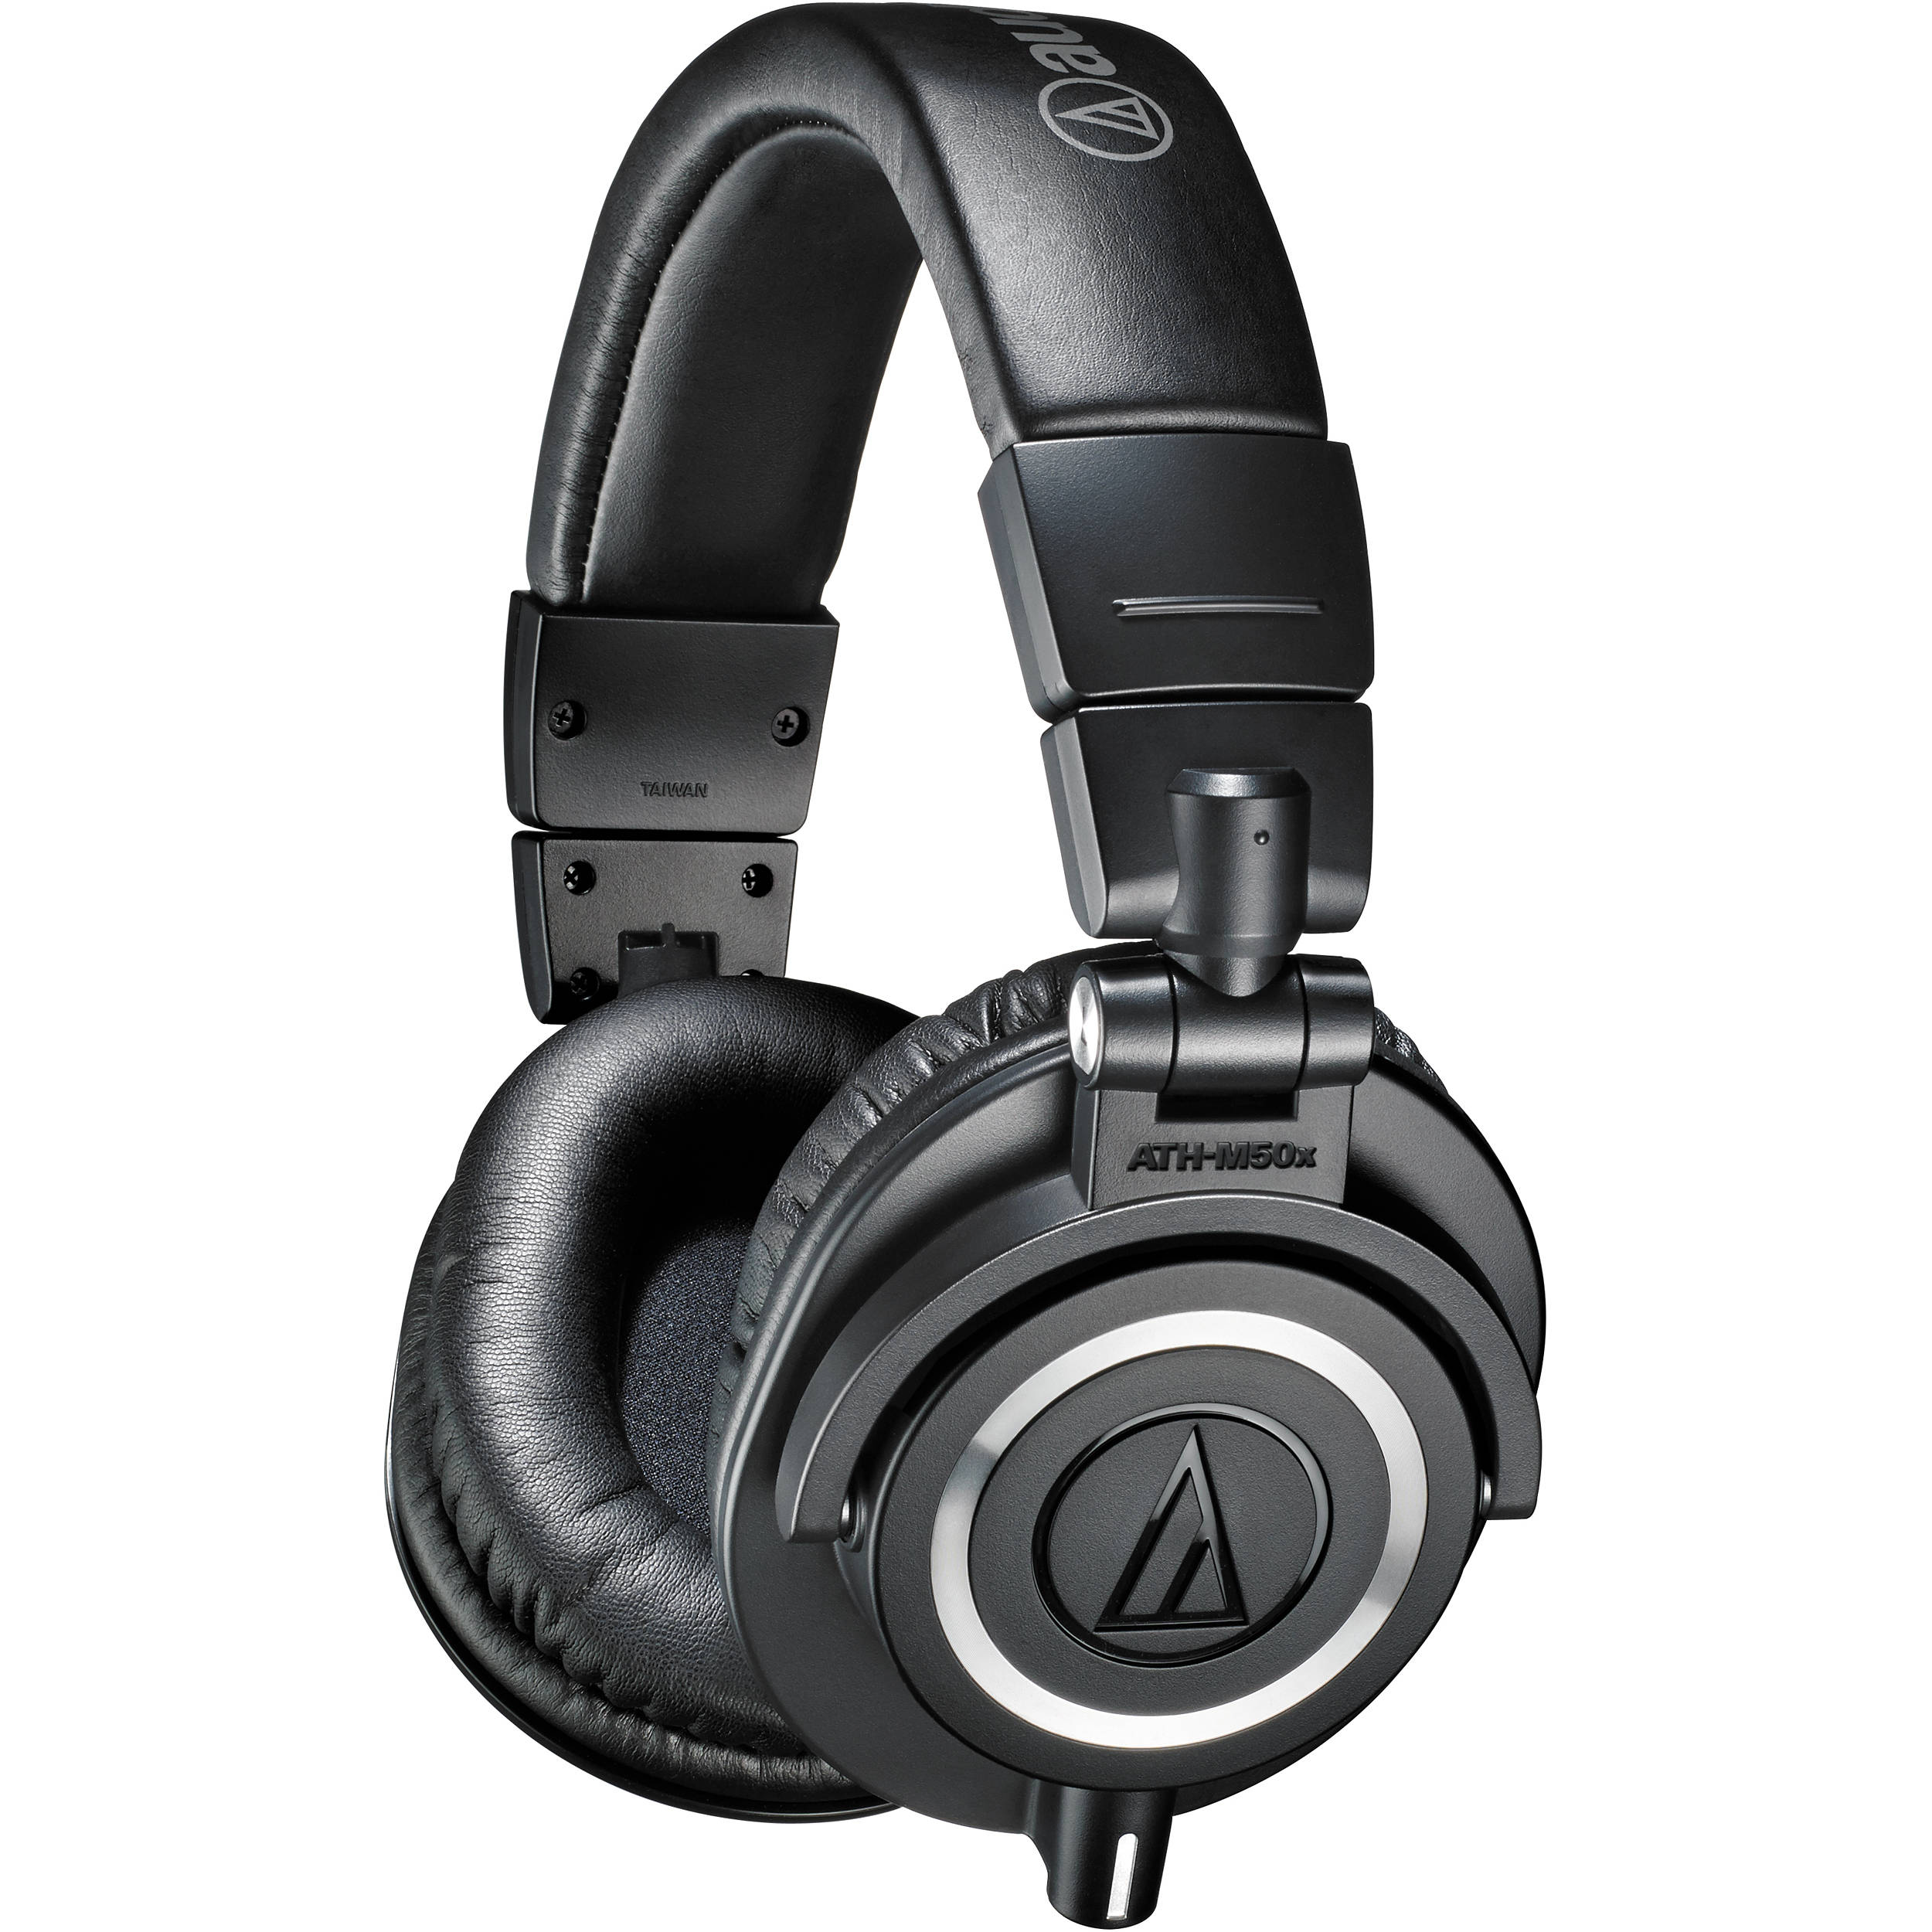 fb8f8c4da80 Audio-Technica ATH-M50x Monitor Headphones (Black) ATH-M50X B&H